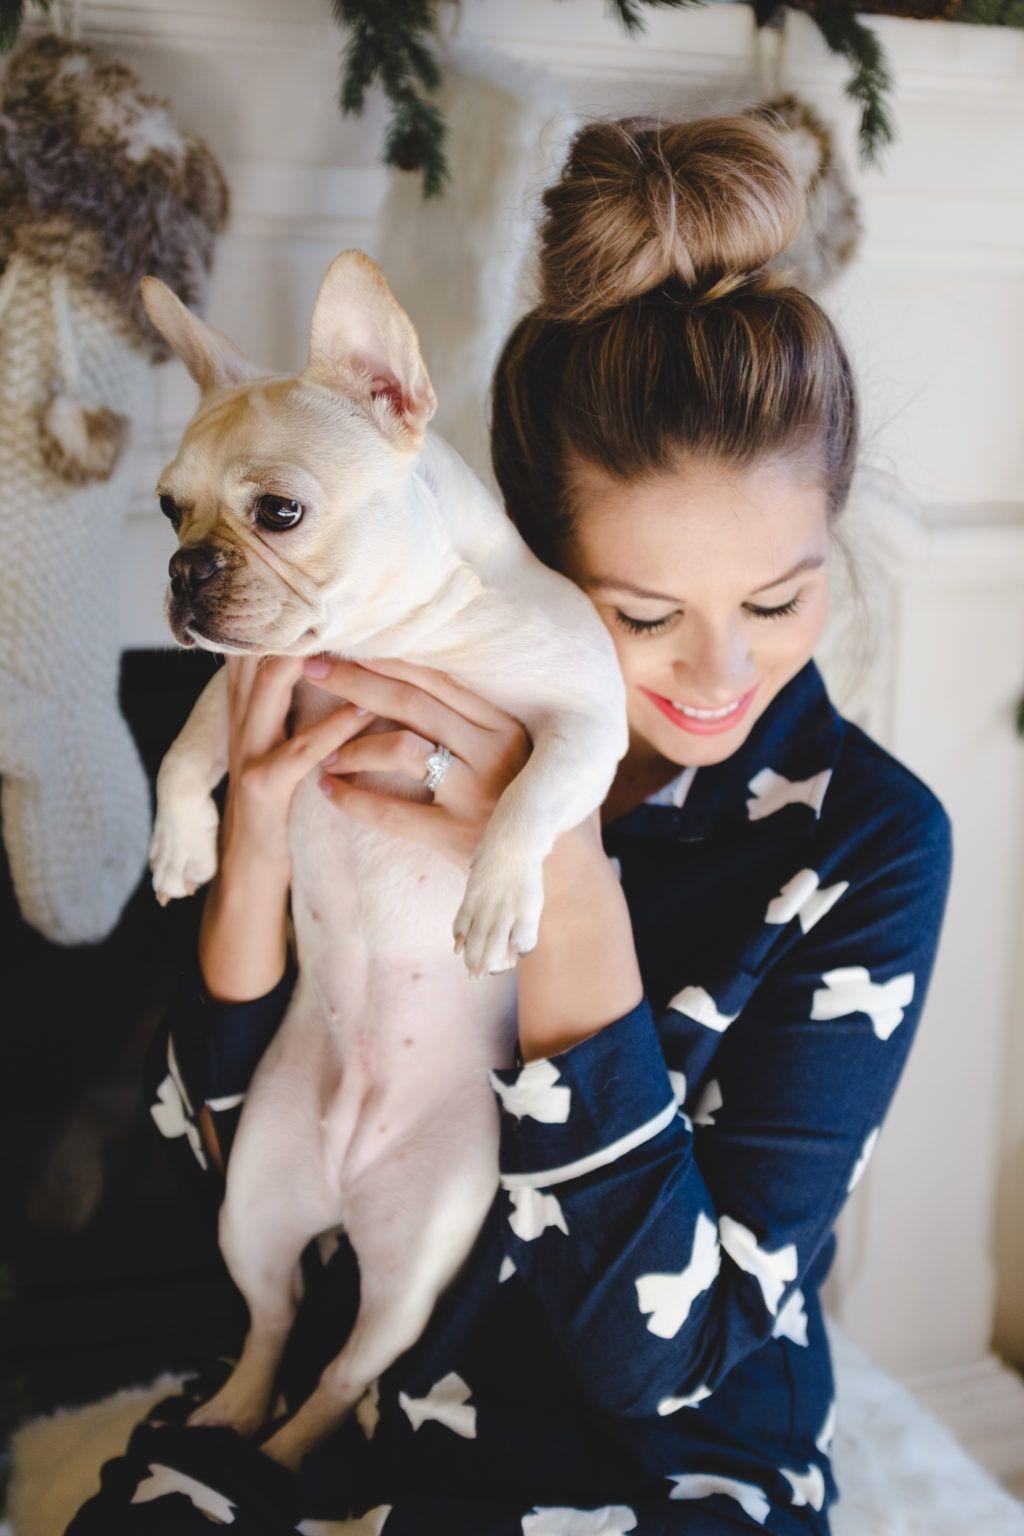 Holiday Gift Ideas Stocking Stuffers Bulldog Puppies French